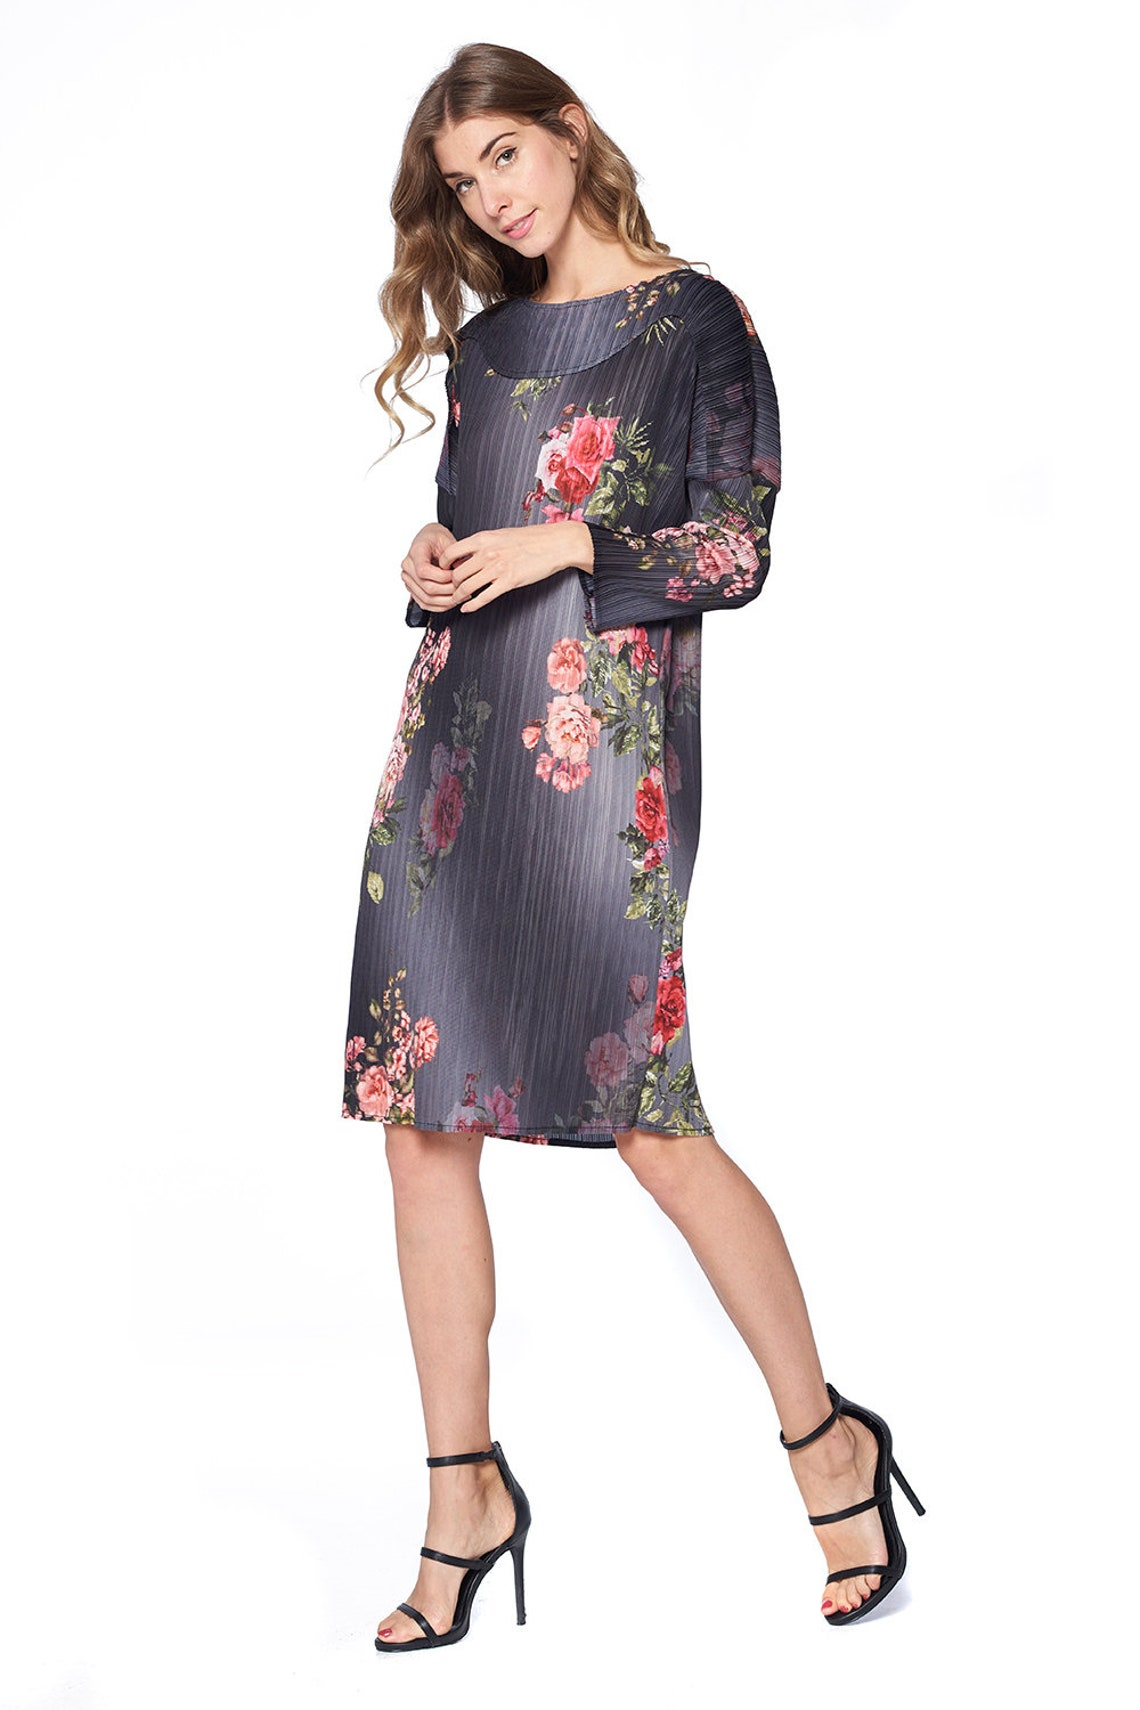 Pleated Edite Flower Dress Grey 60996